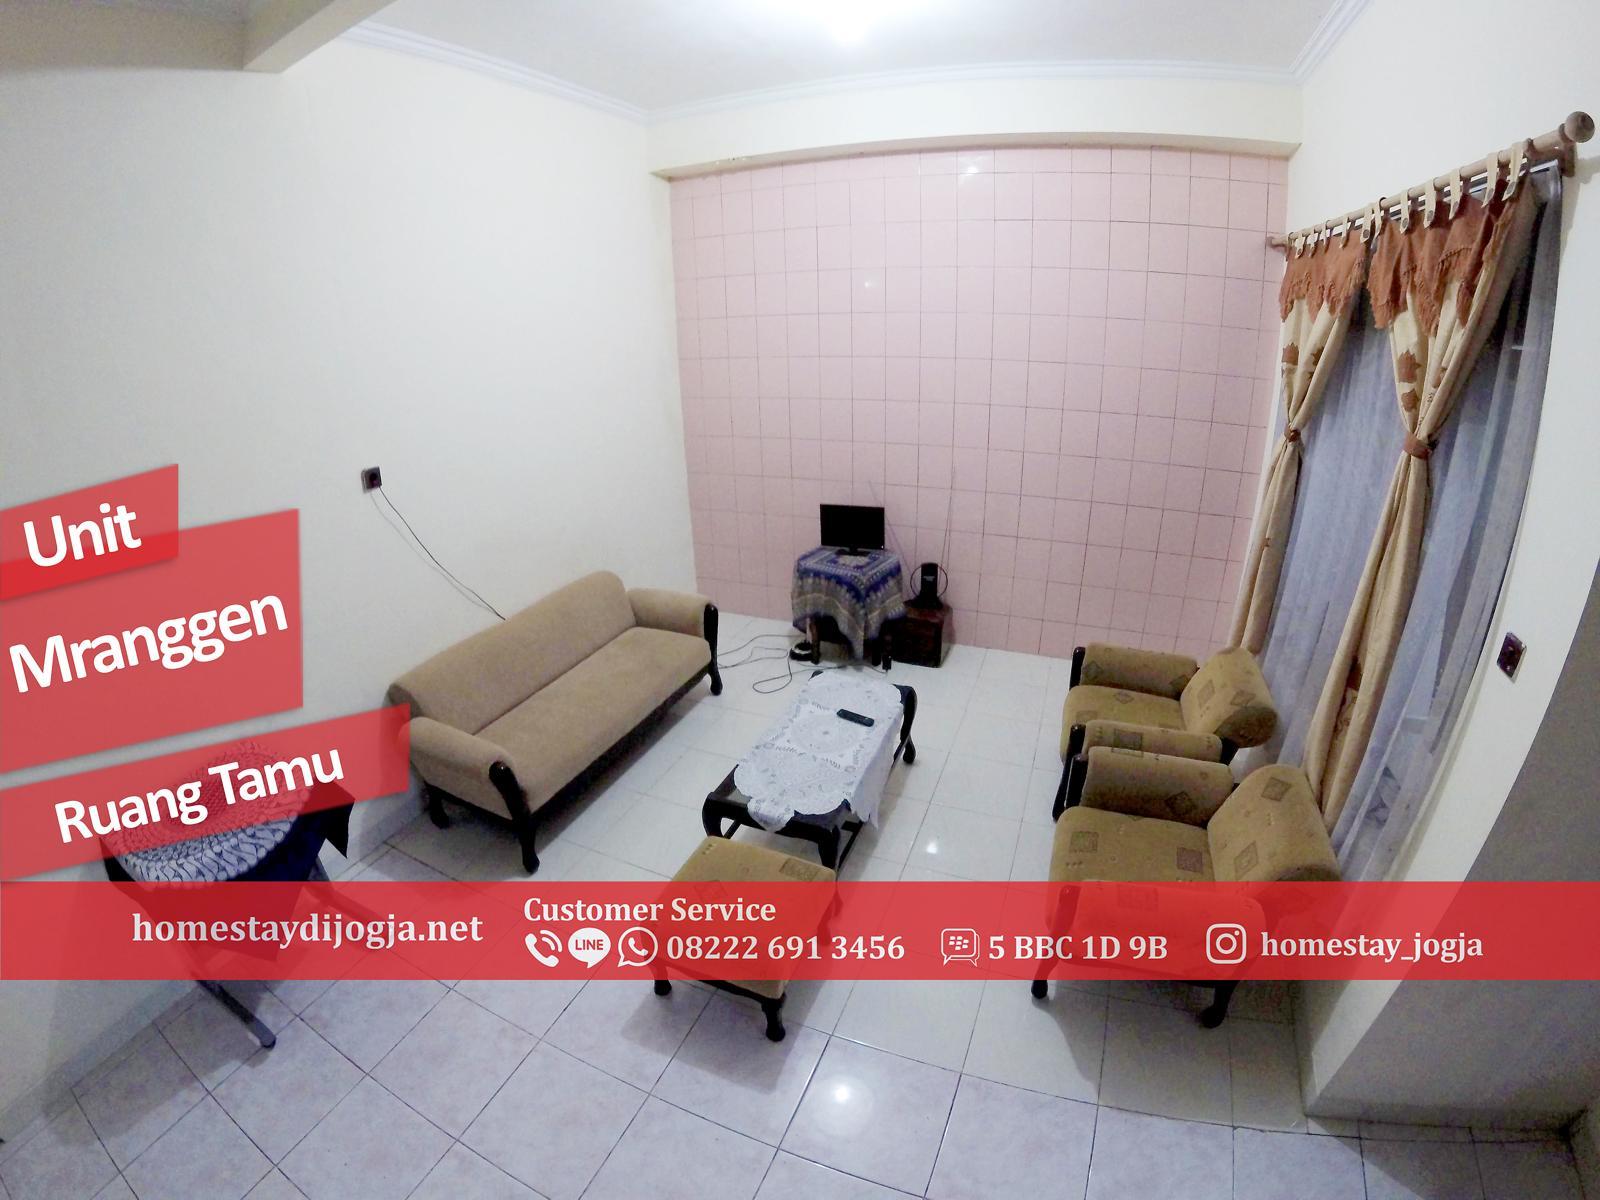 Guest House Jogja 4 kamar FAN di Mranggen 15 menit menuju malioboro